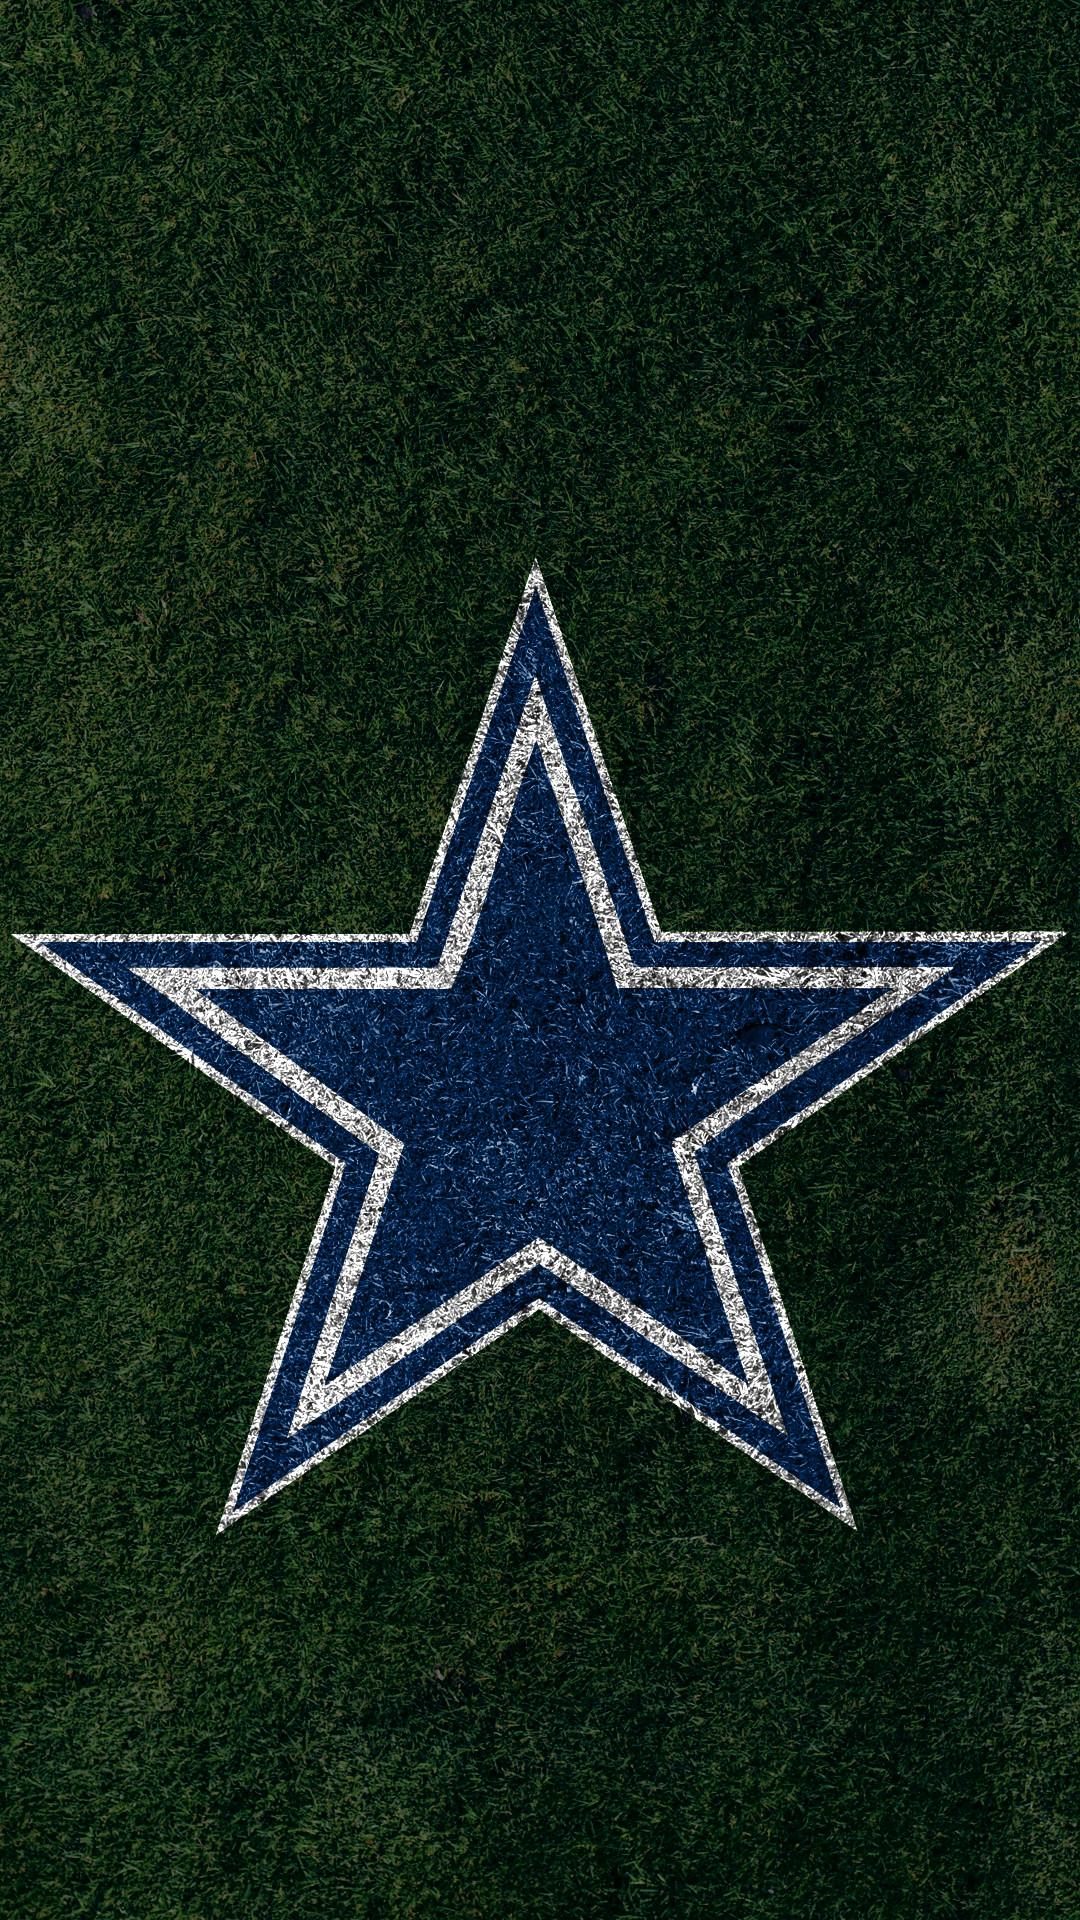 Dallas Cowboys Backgrounds For Desktop Wallpaper